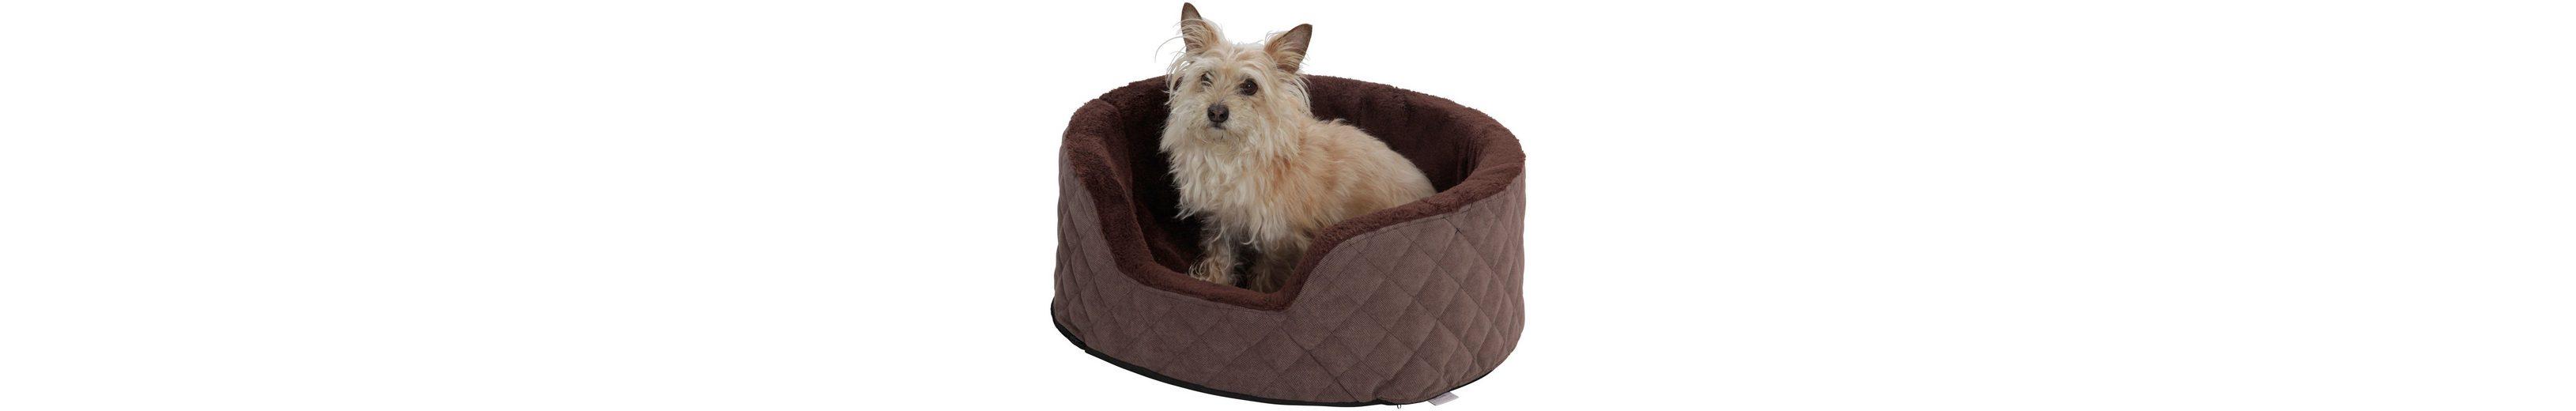 Hundekorb »Madison«, B/T/H: 65/50/25 cm, Braun